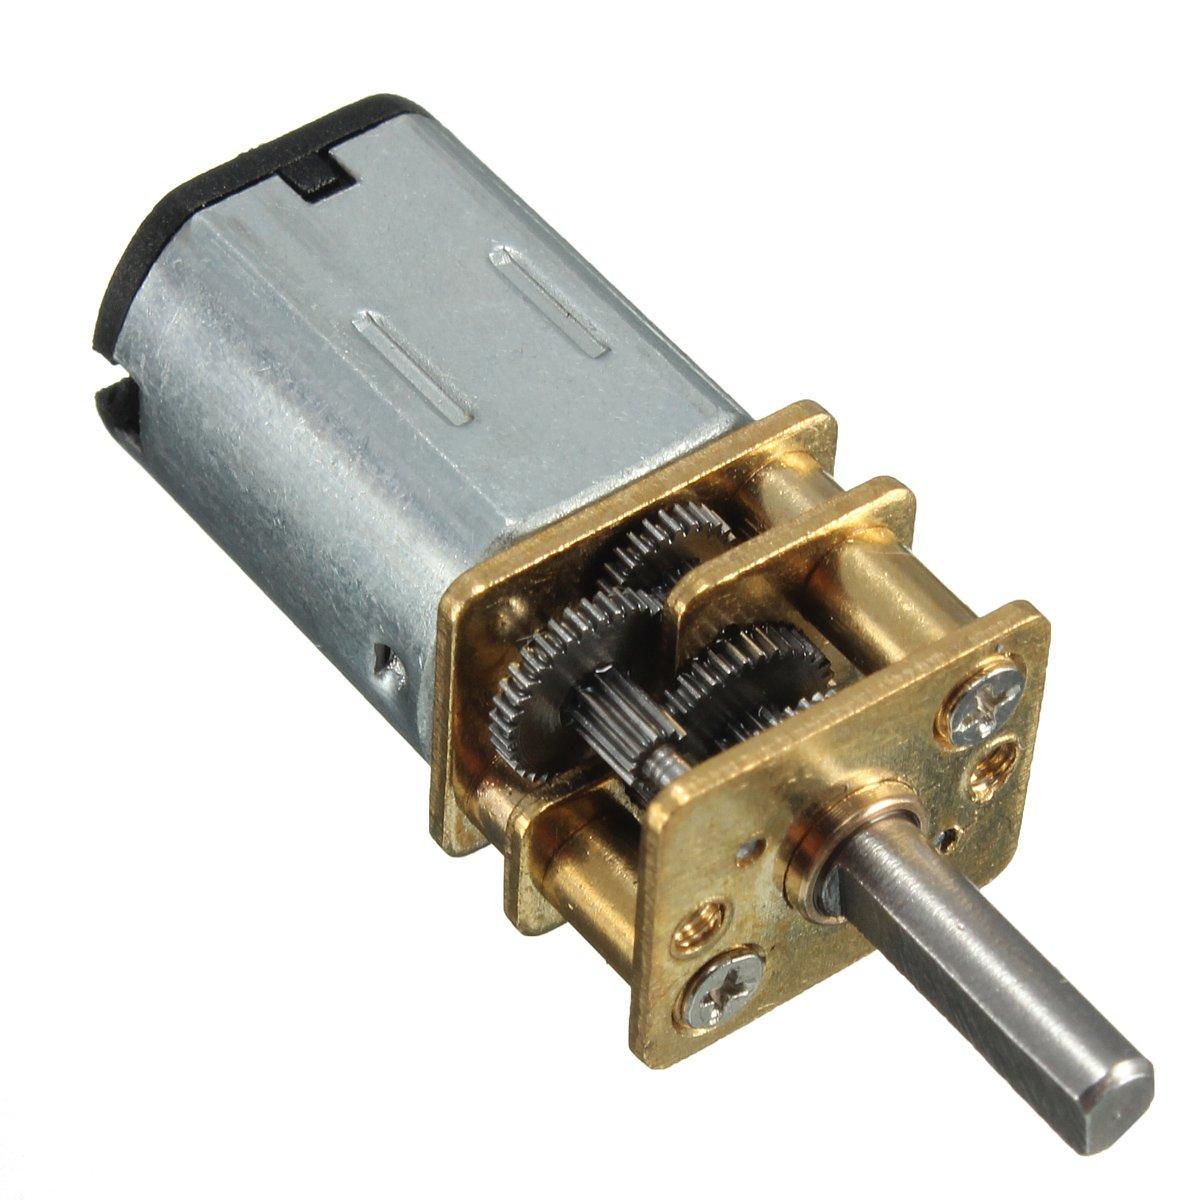 GA12-N20 Mini DC 6V 30RPM Gear Motor Ils